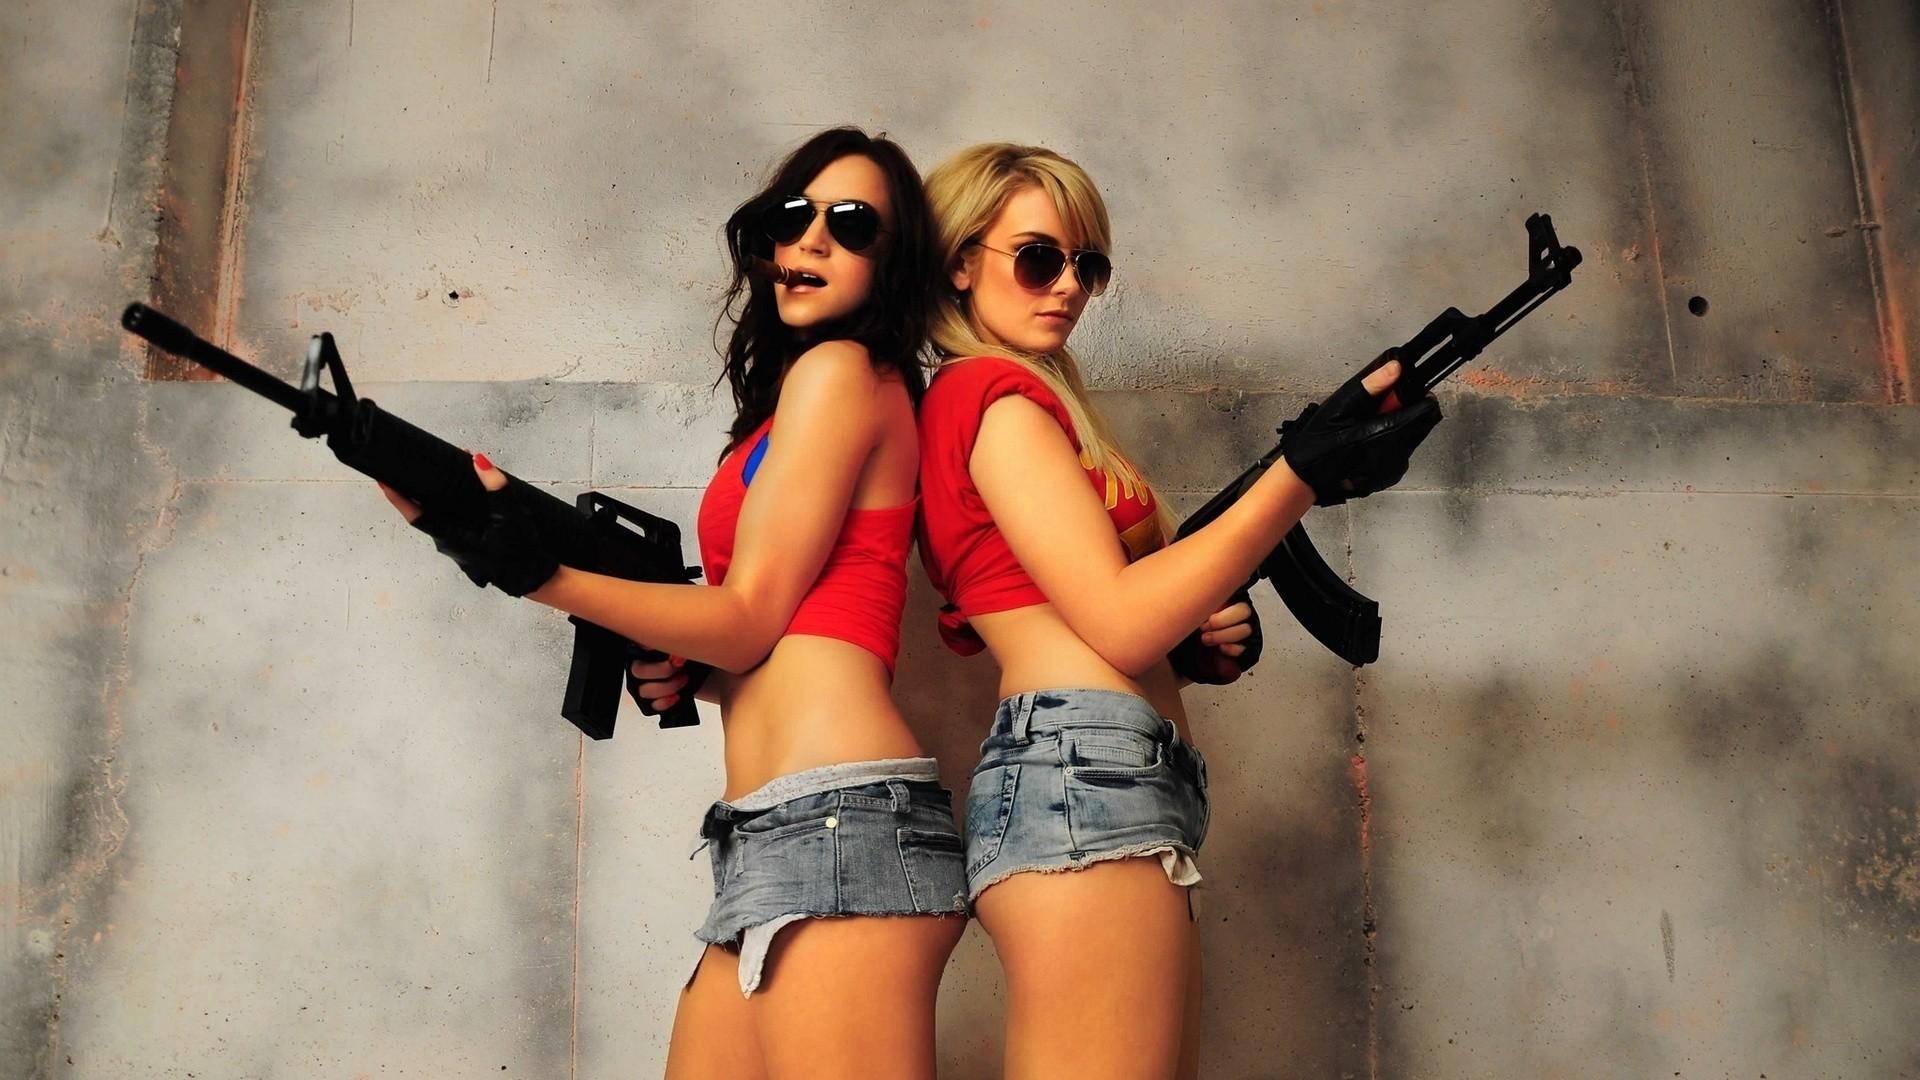 Explore Girl Guns, Weapons Guns, and more!